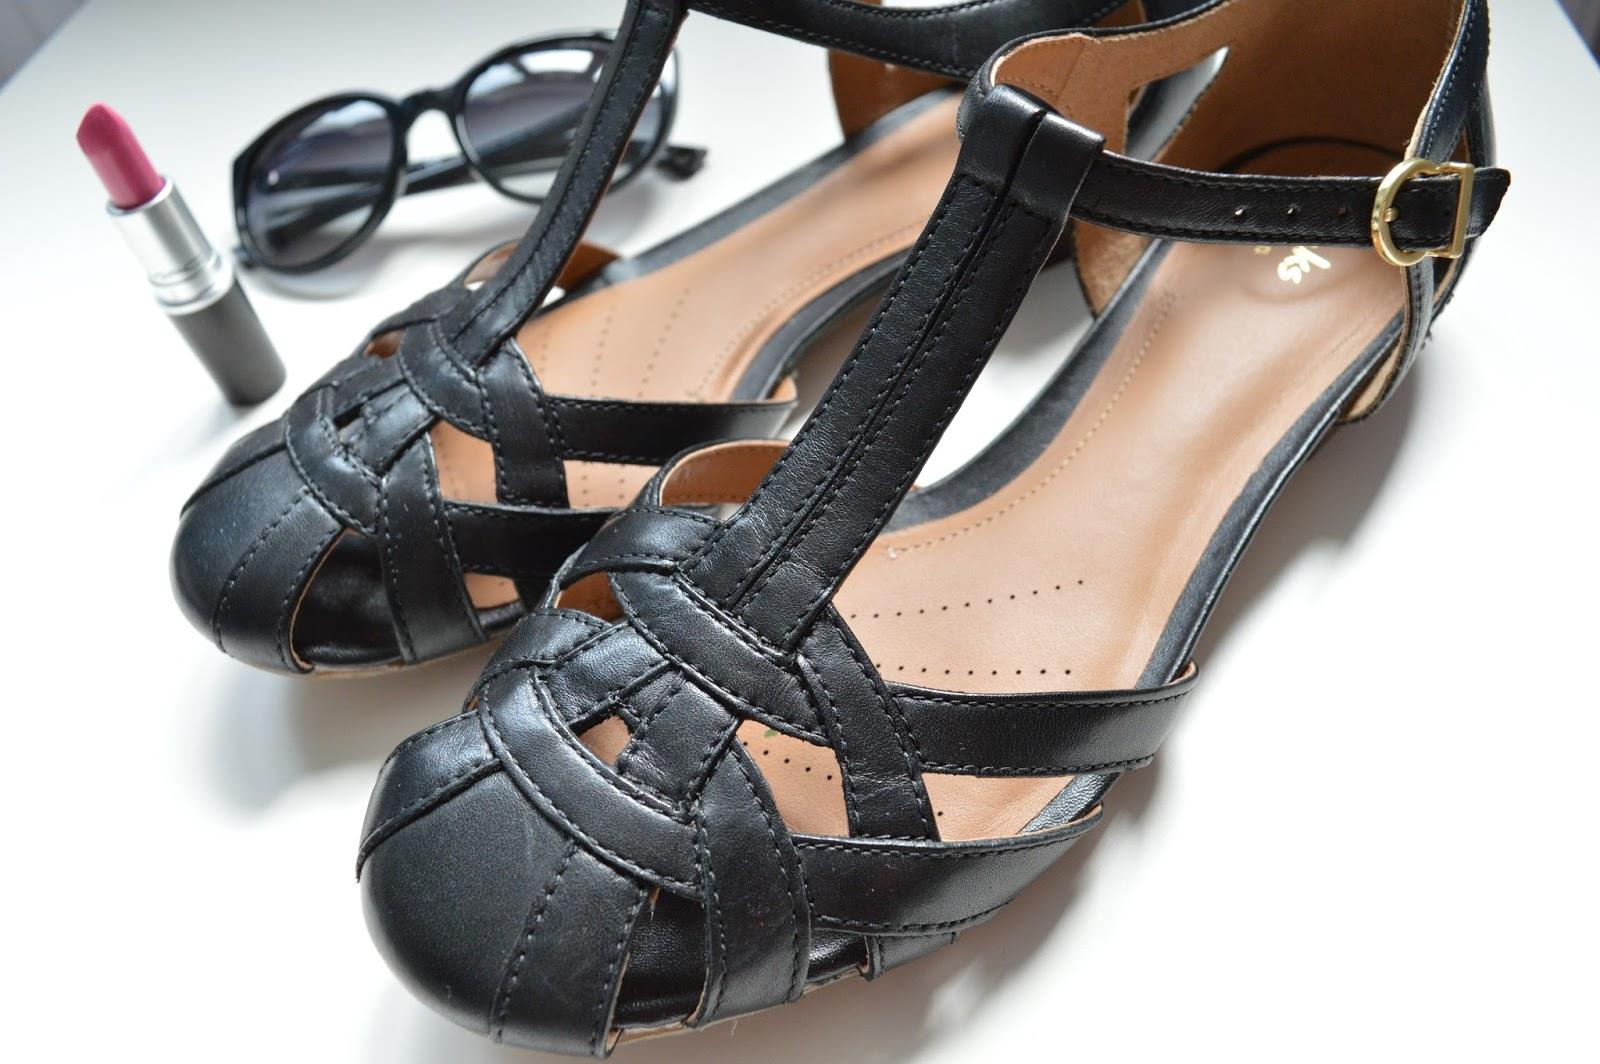 7a56ca874 Brantano Clarks Henderson Luck Sandals